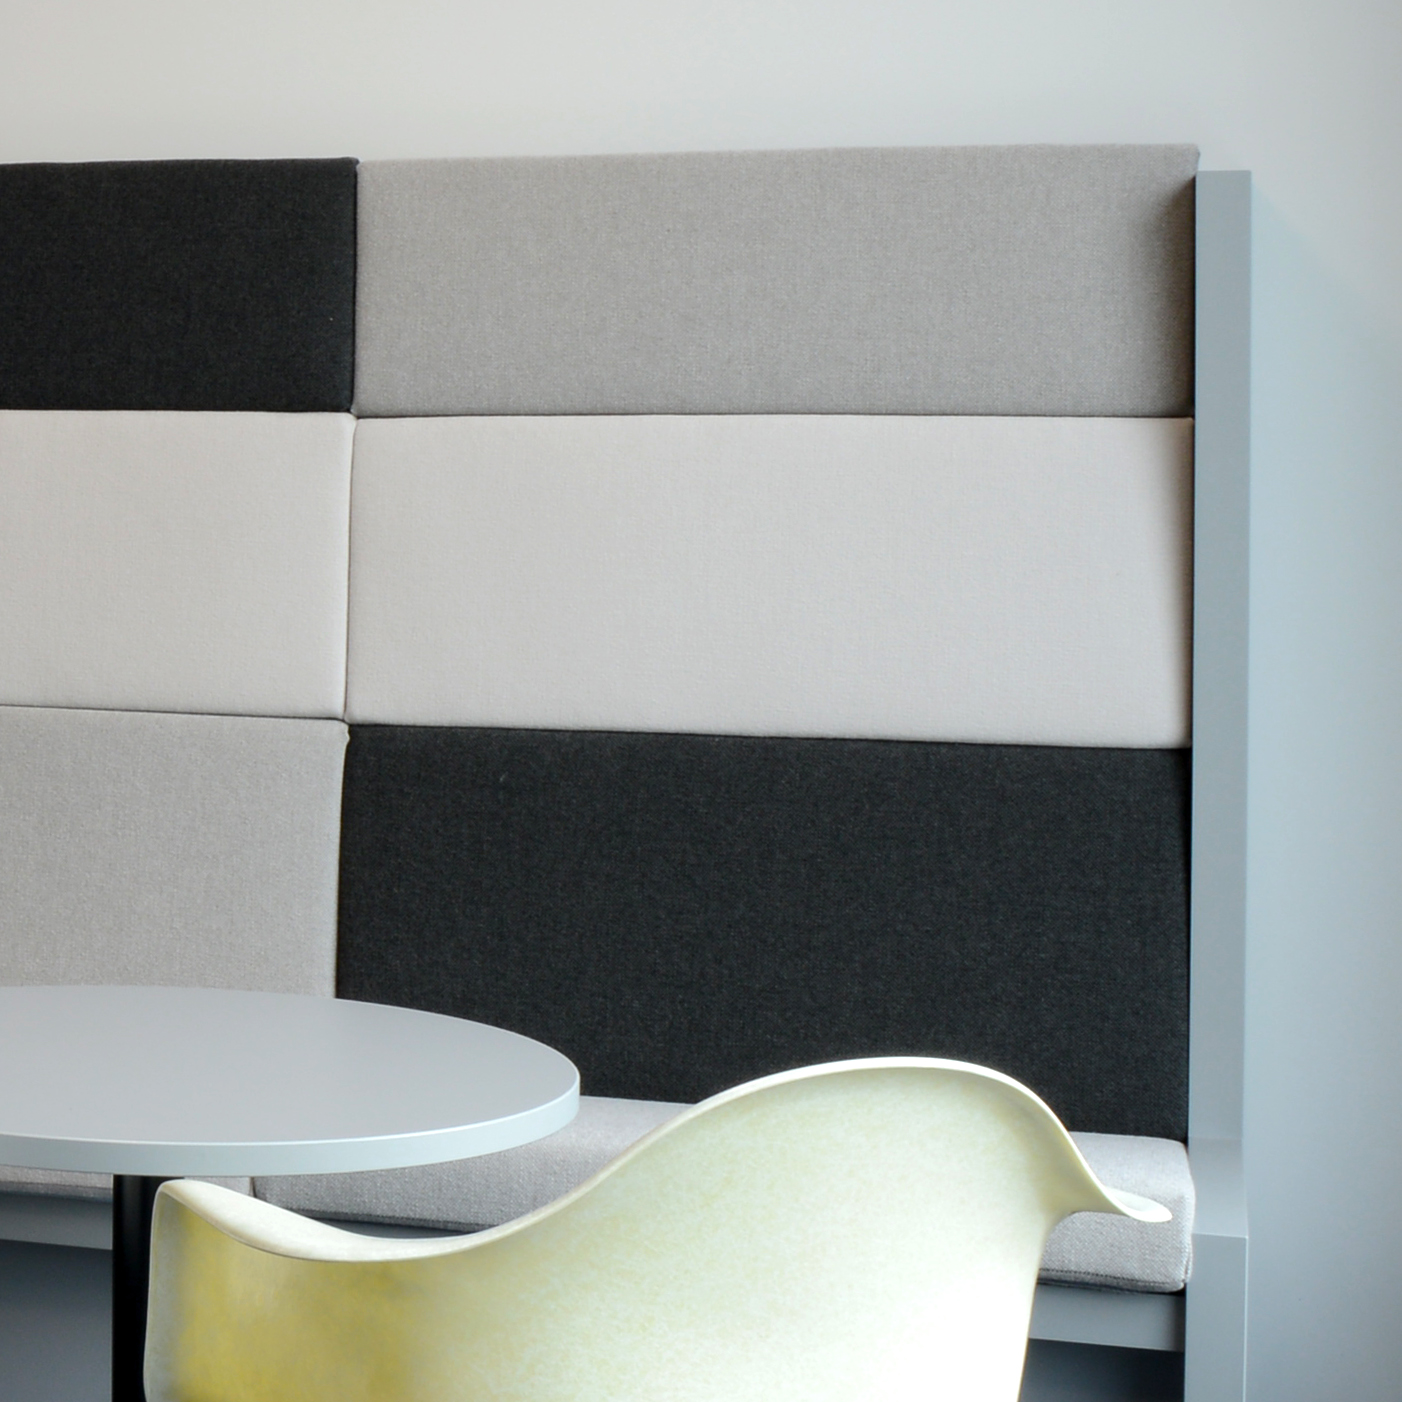 Walo Gestaltung Office Design